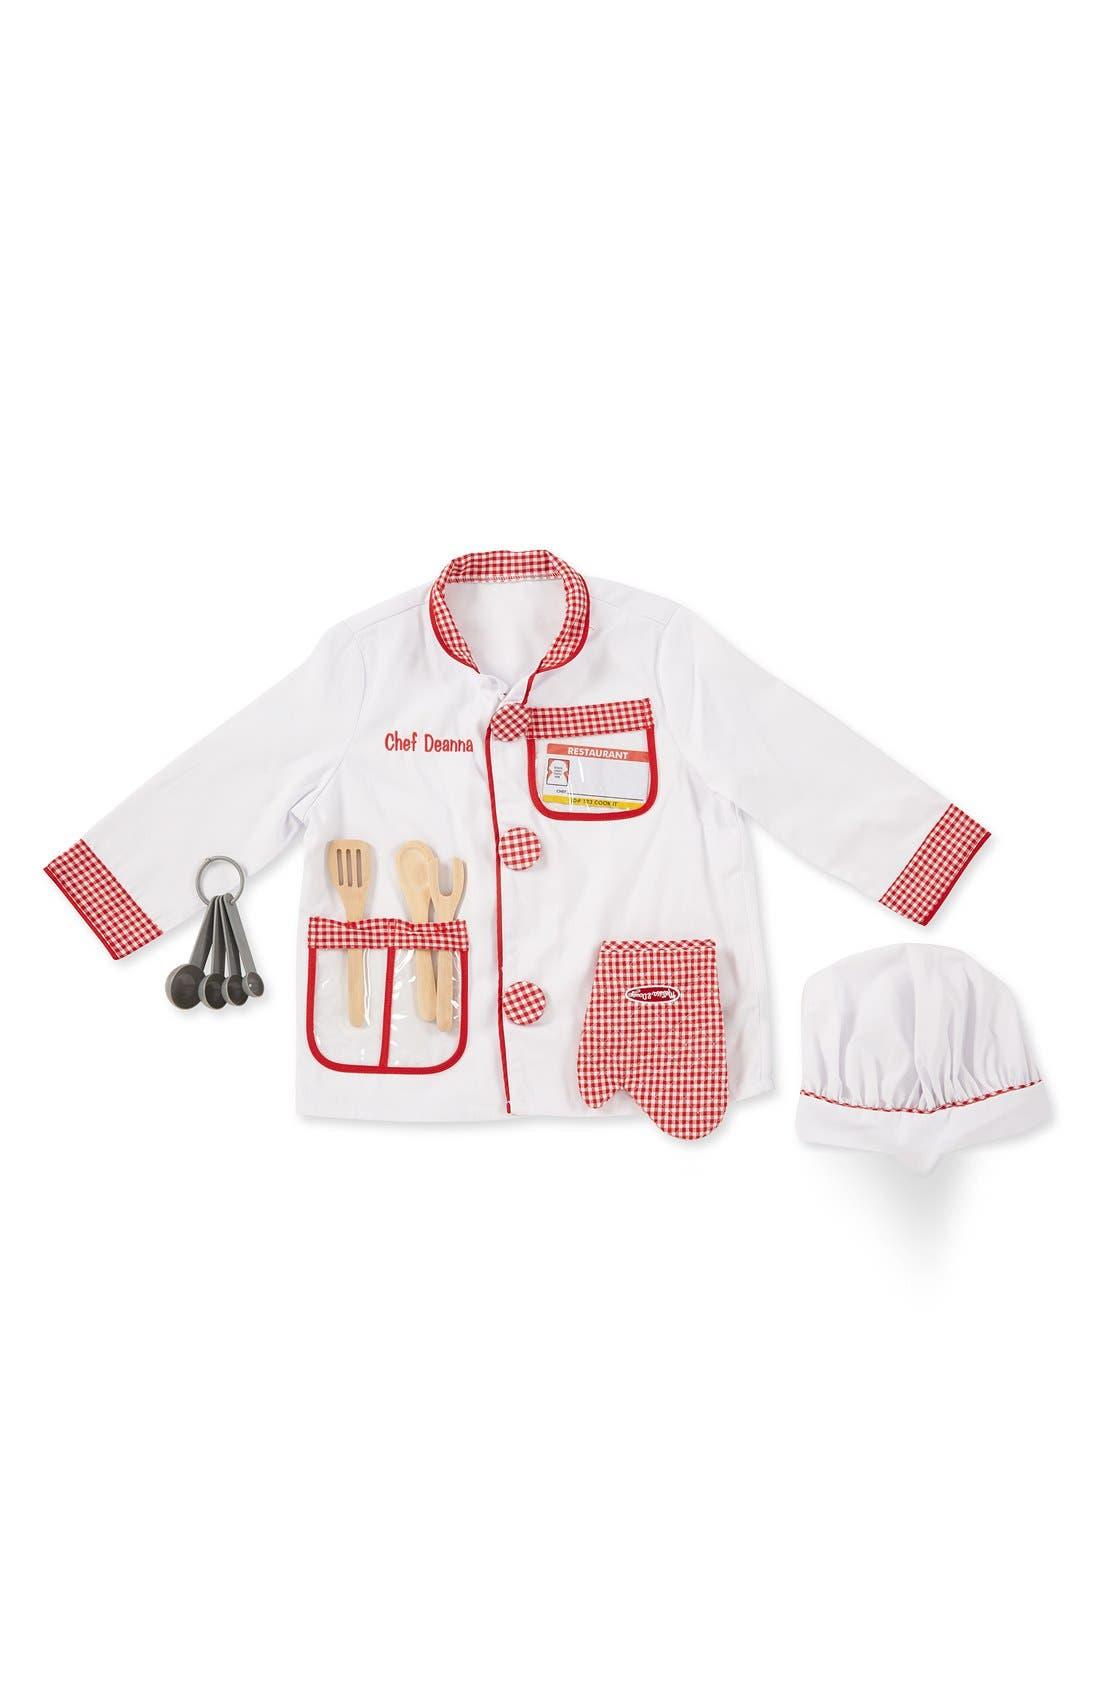 Melissa & Doug 'Chef' Personalized Costume Set (Toddler)